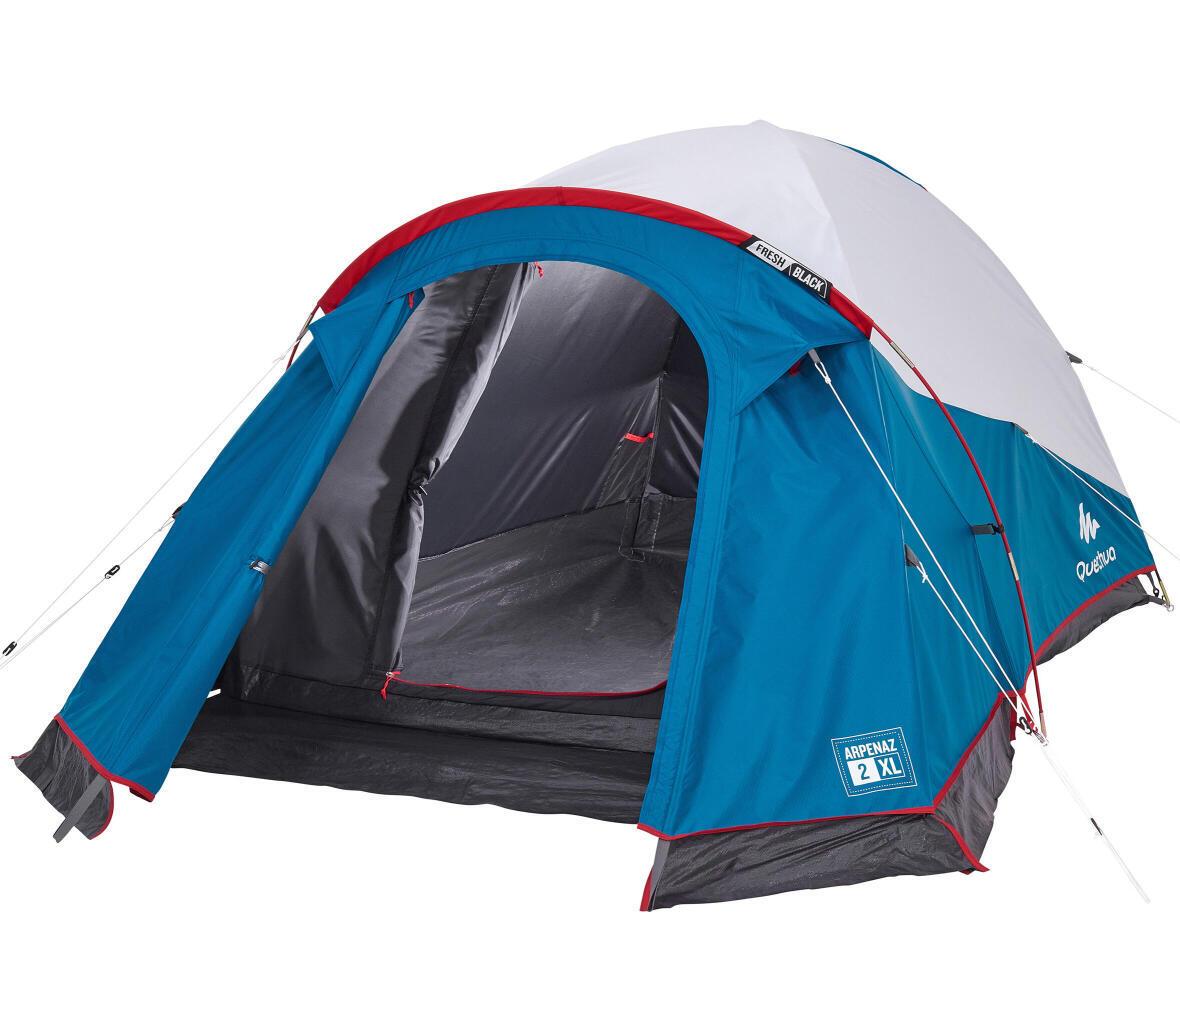 herstellen-tent-arpenaz-2-personen-XL-fresh-and-black-quechua-stuk